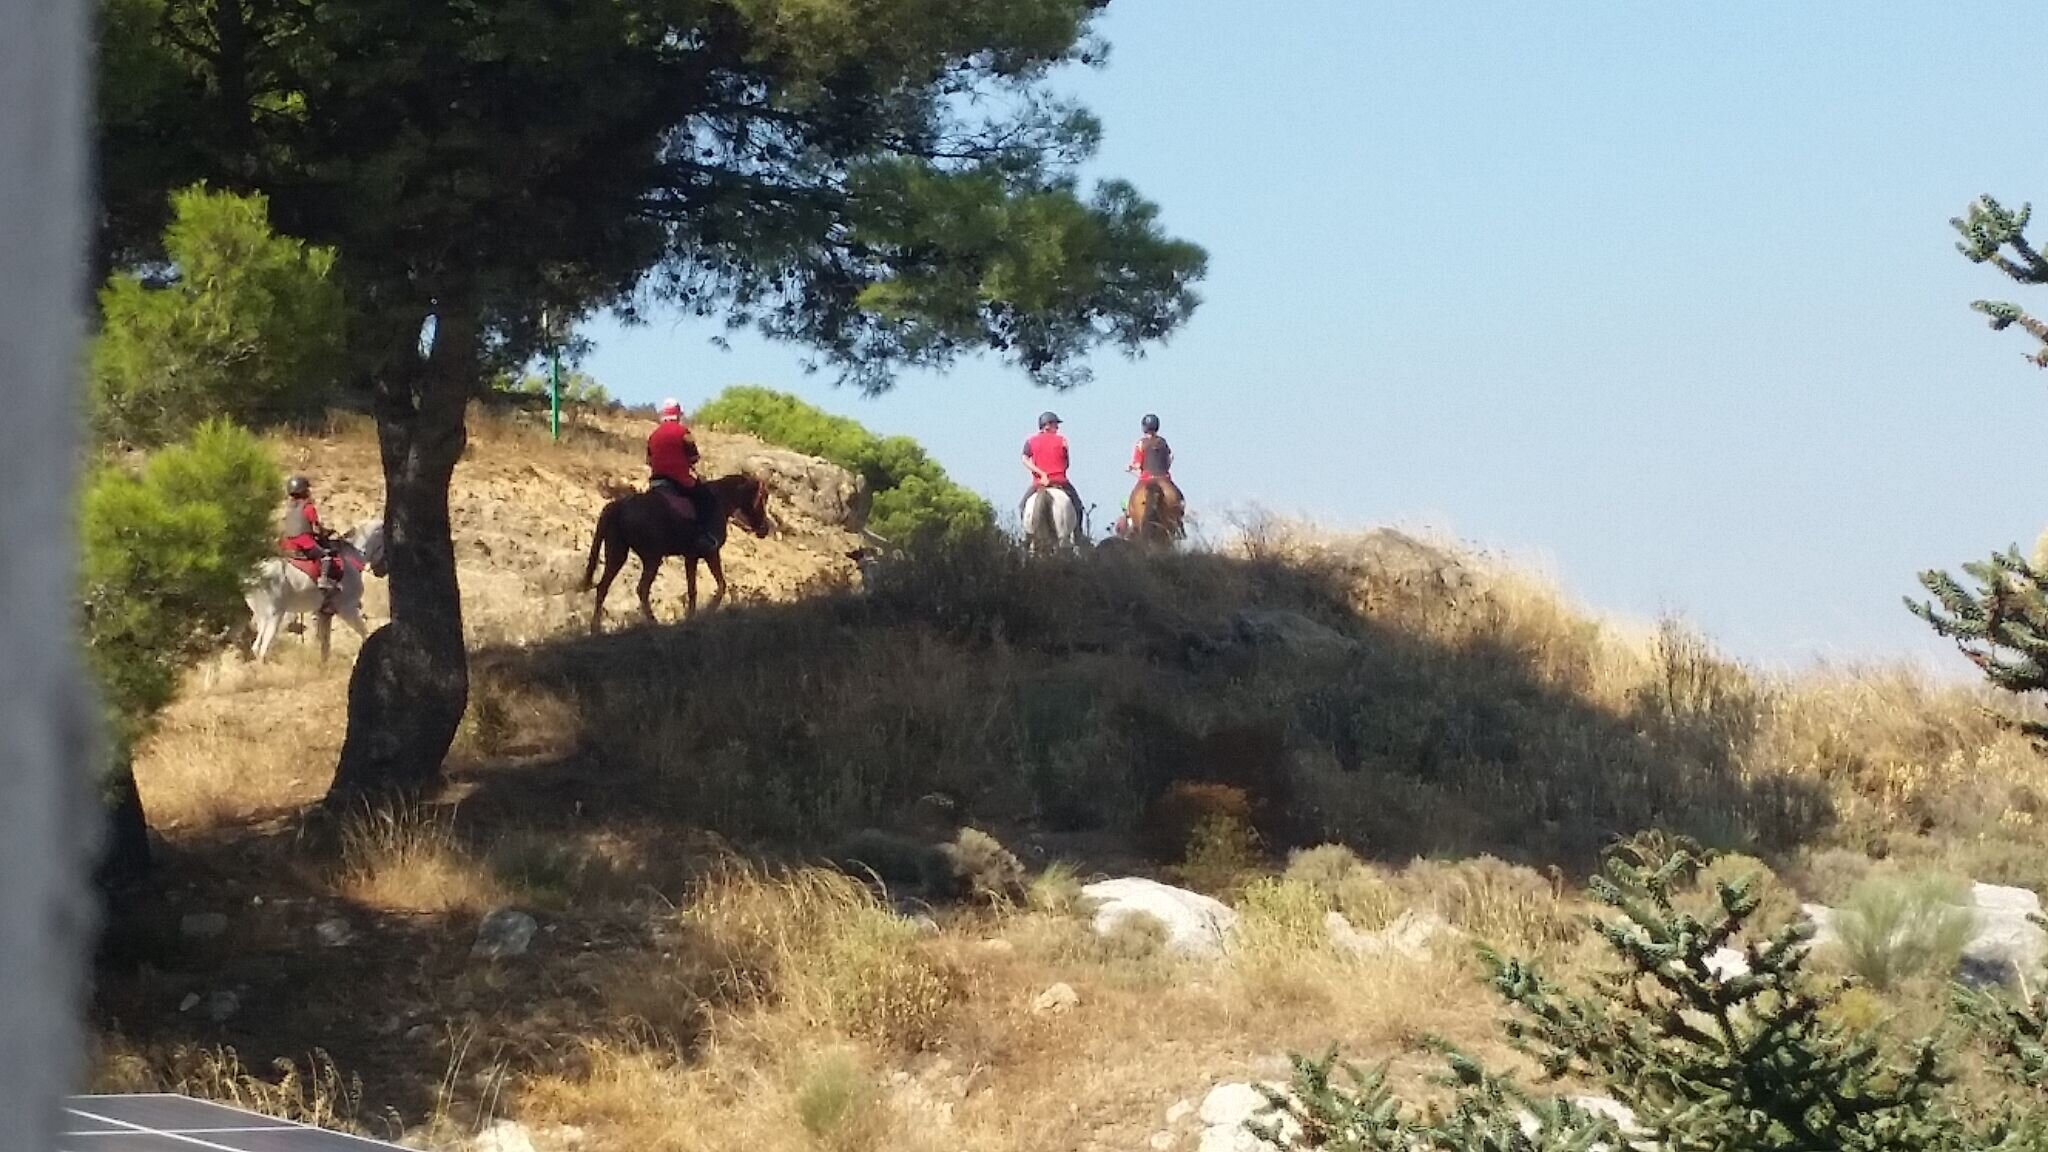 Treking on horseback through the mountains